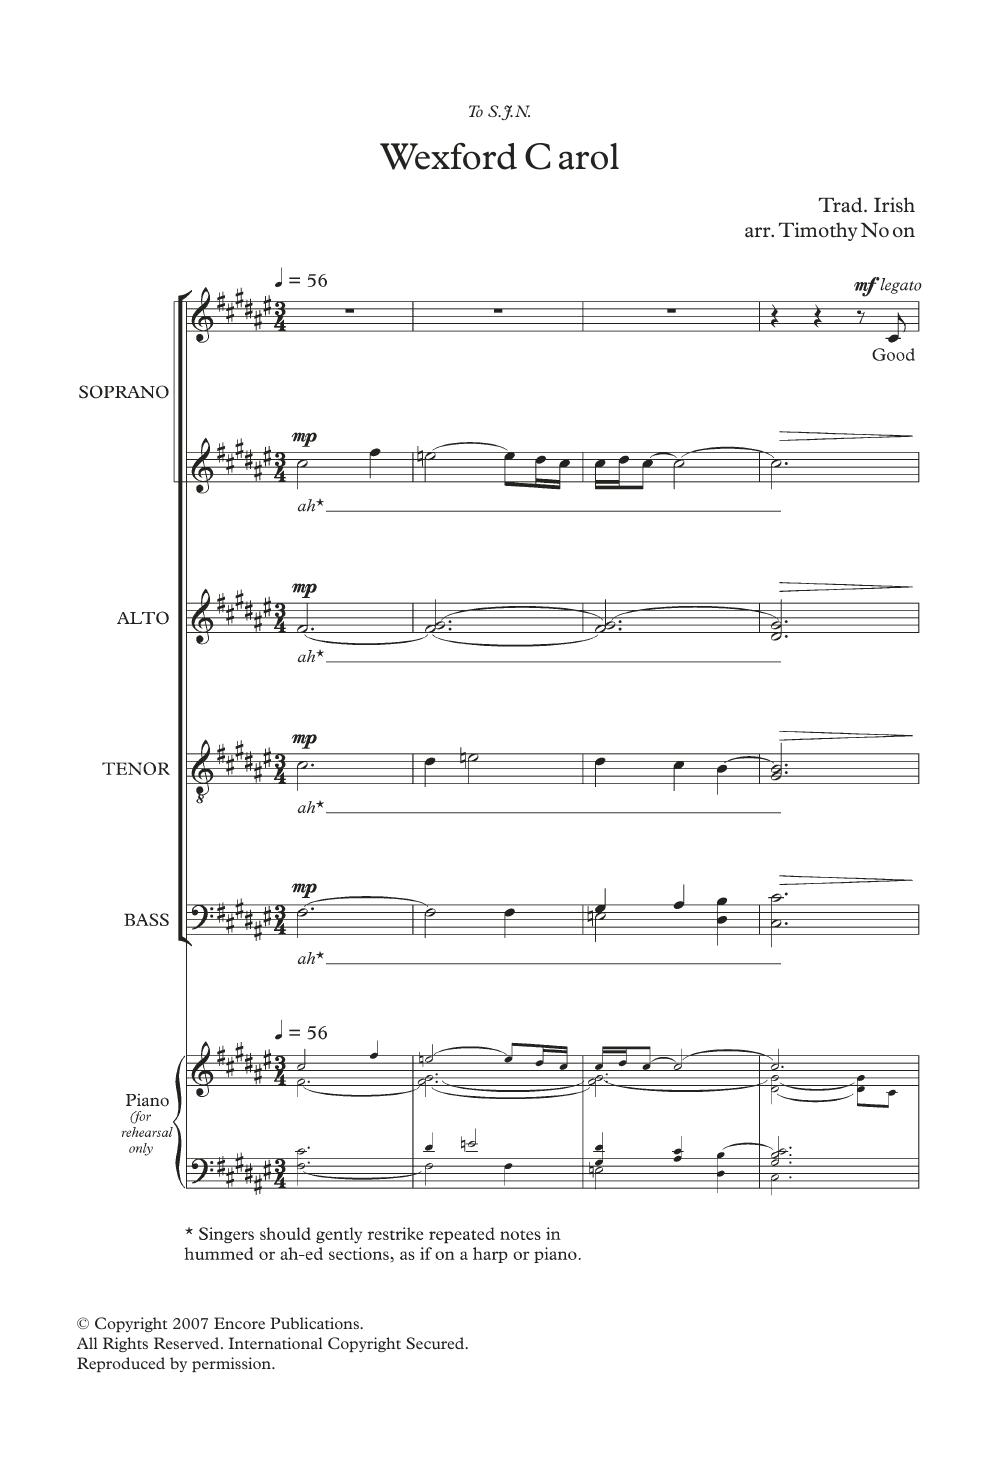 Wexford Carol (arr. Timothy Noon) Sheet Music